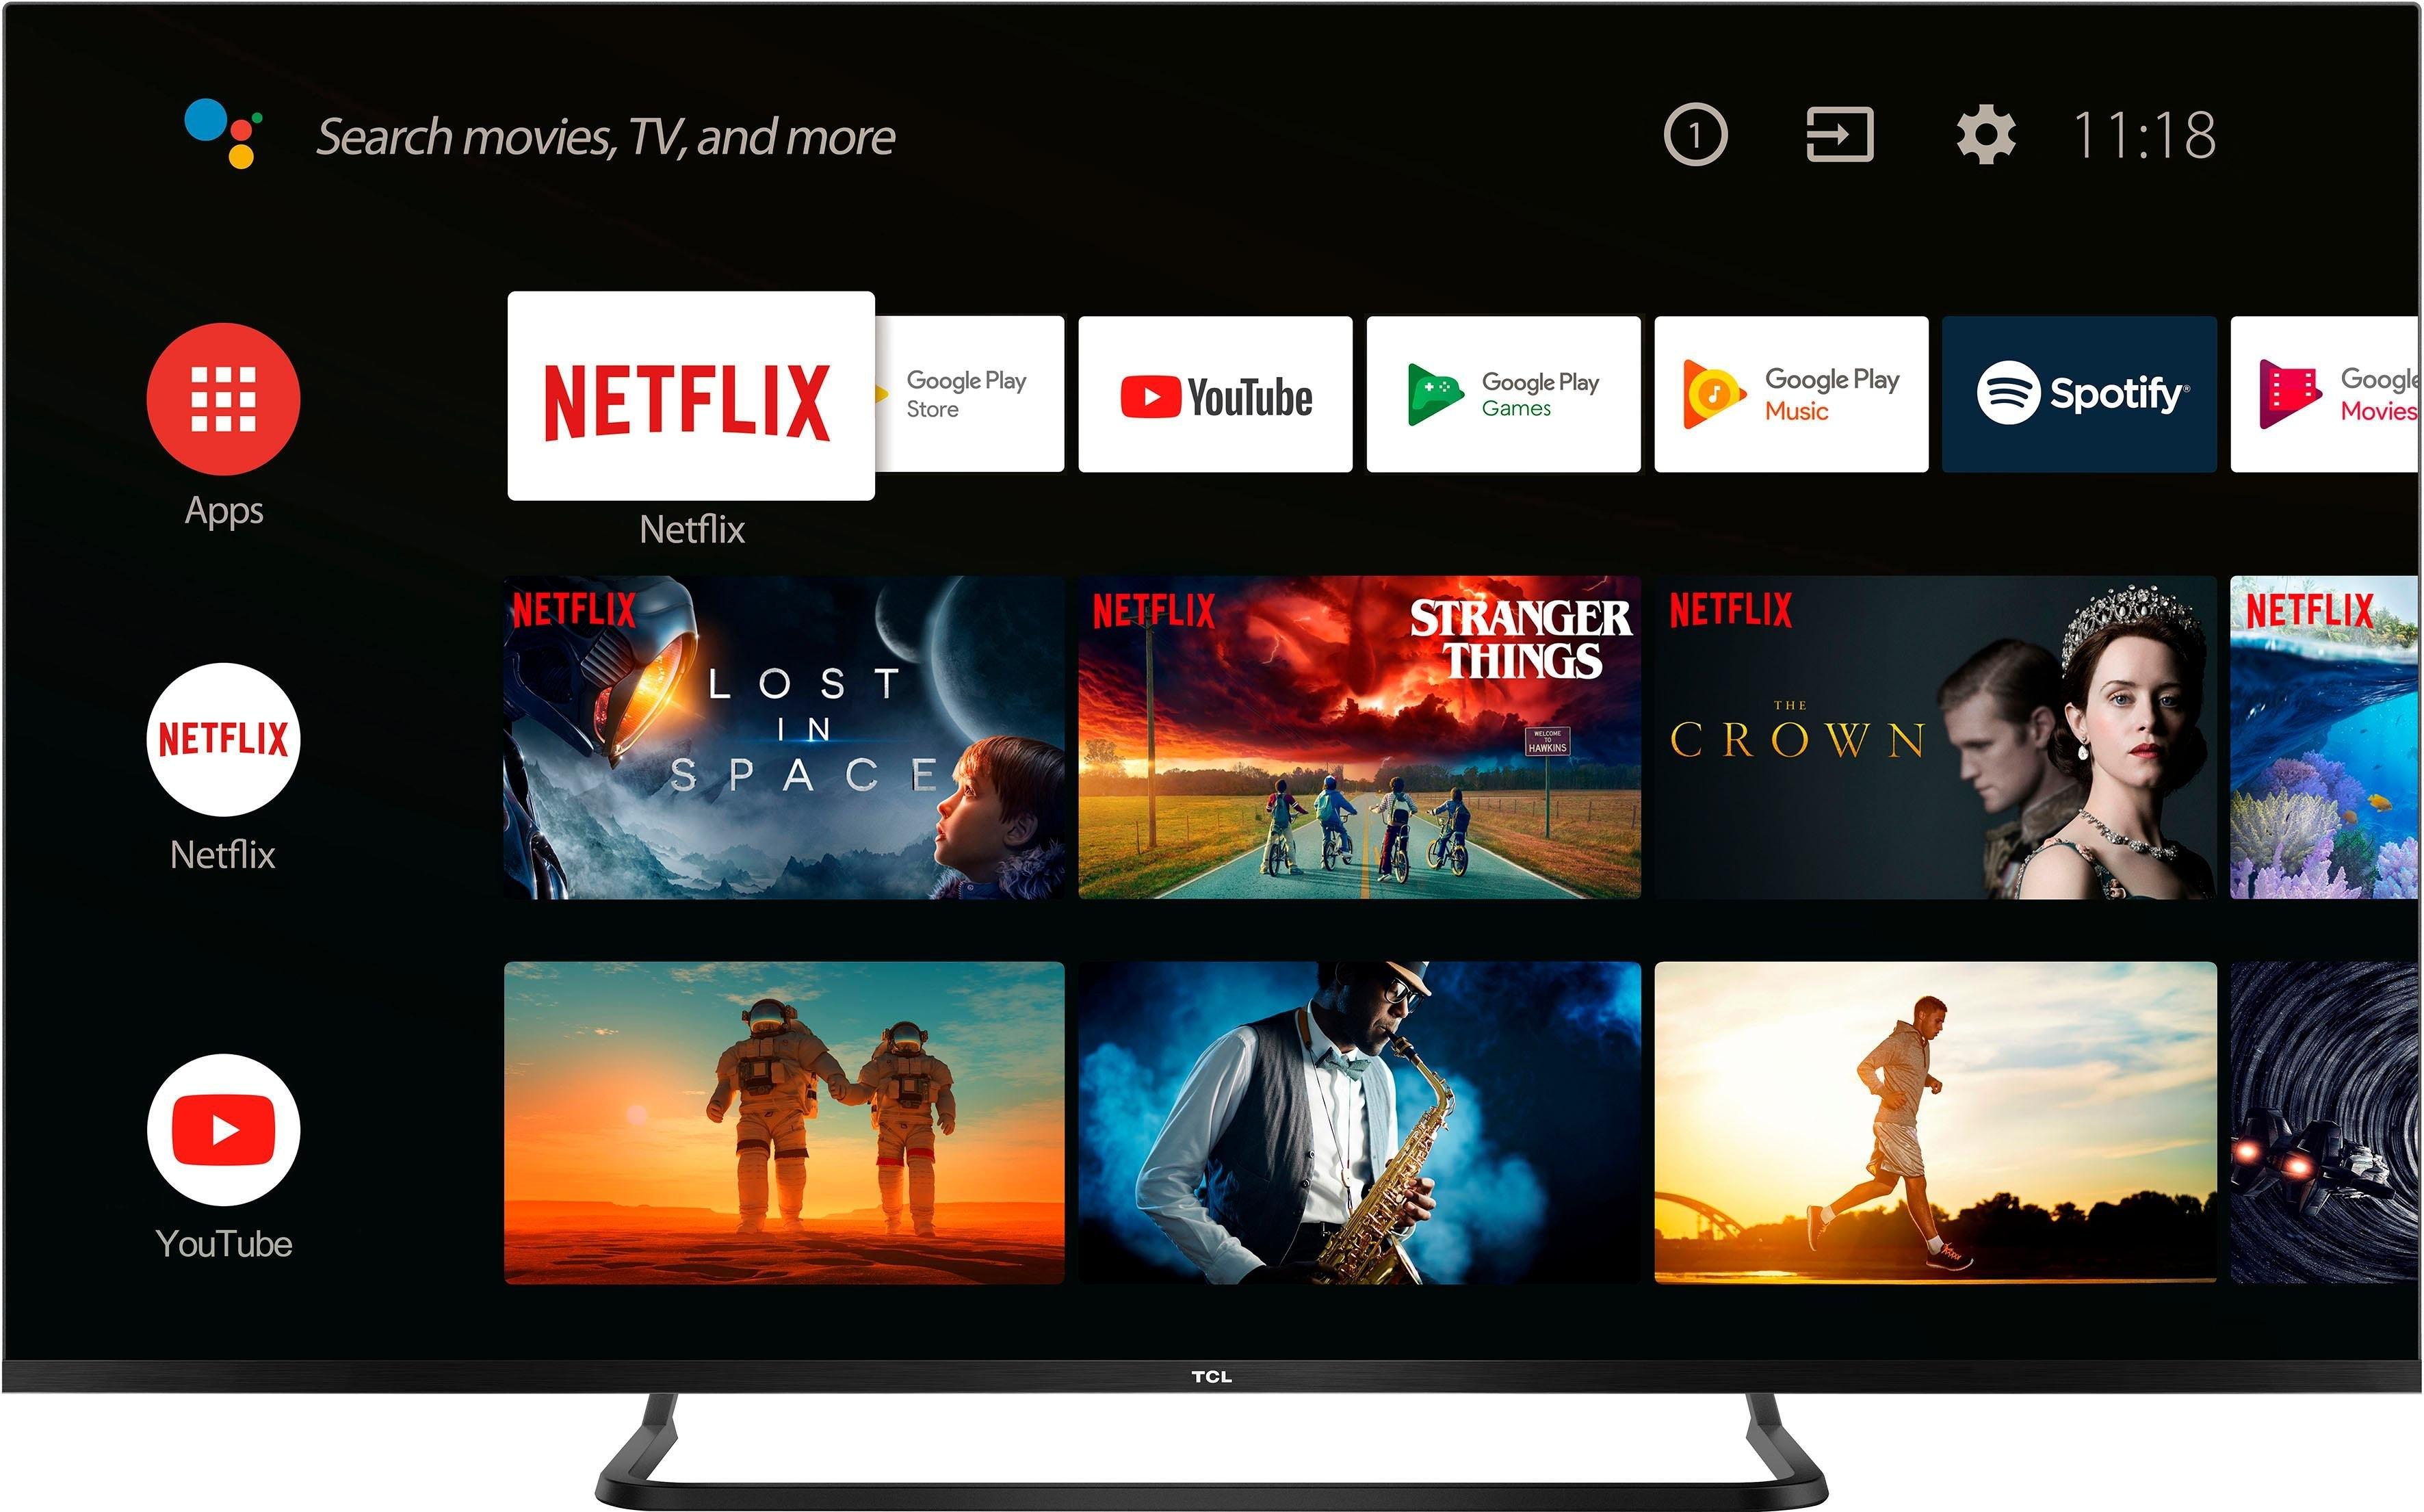 Tcl 50EP680 led-tv (126 cm / 50 inch), 4K Ultra HD, smart-tv - gratis ruilen op otto.nl